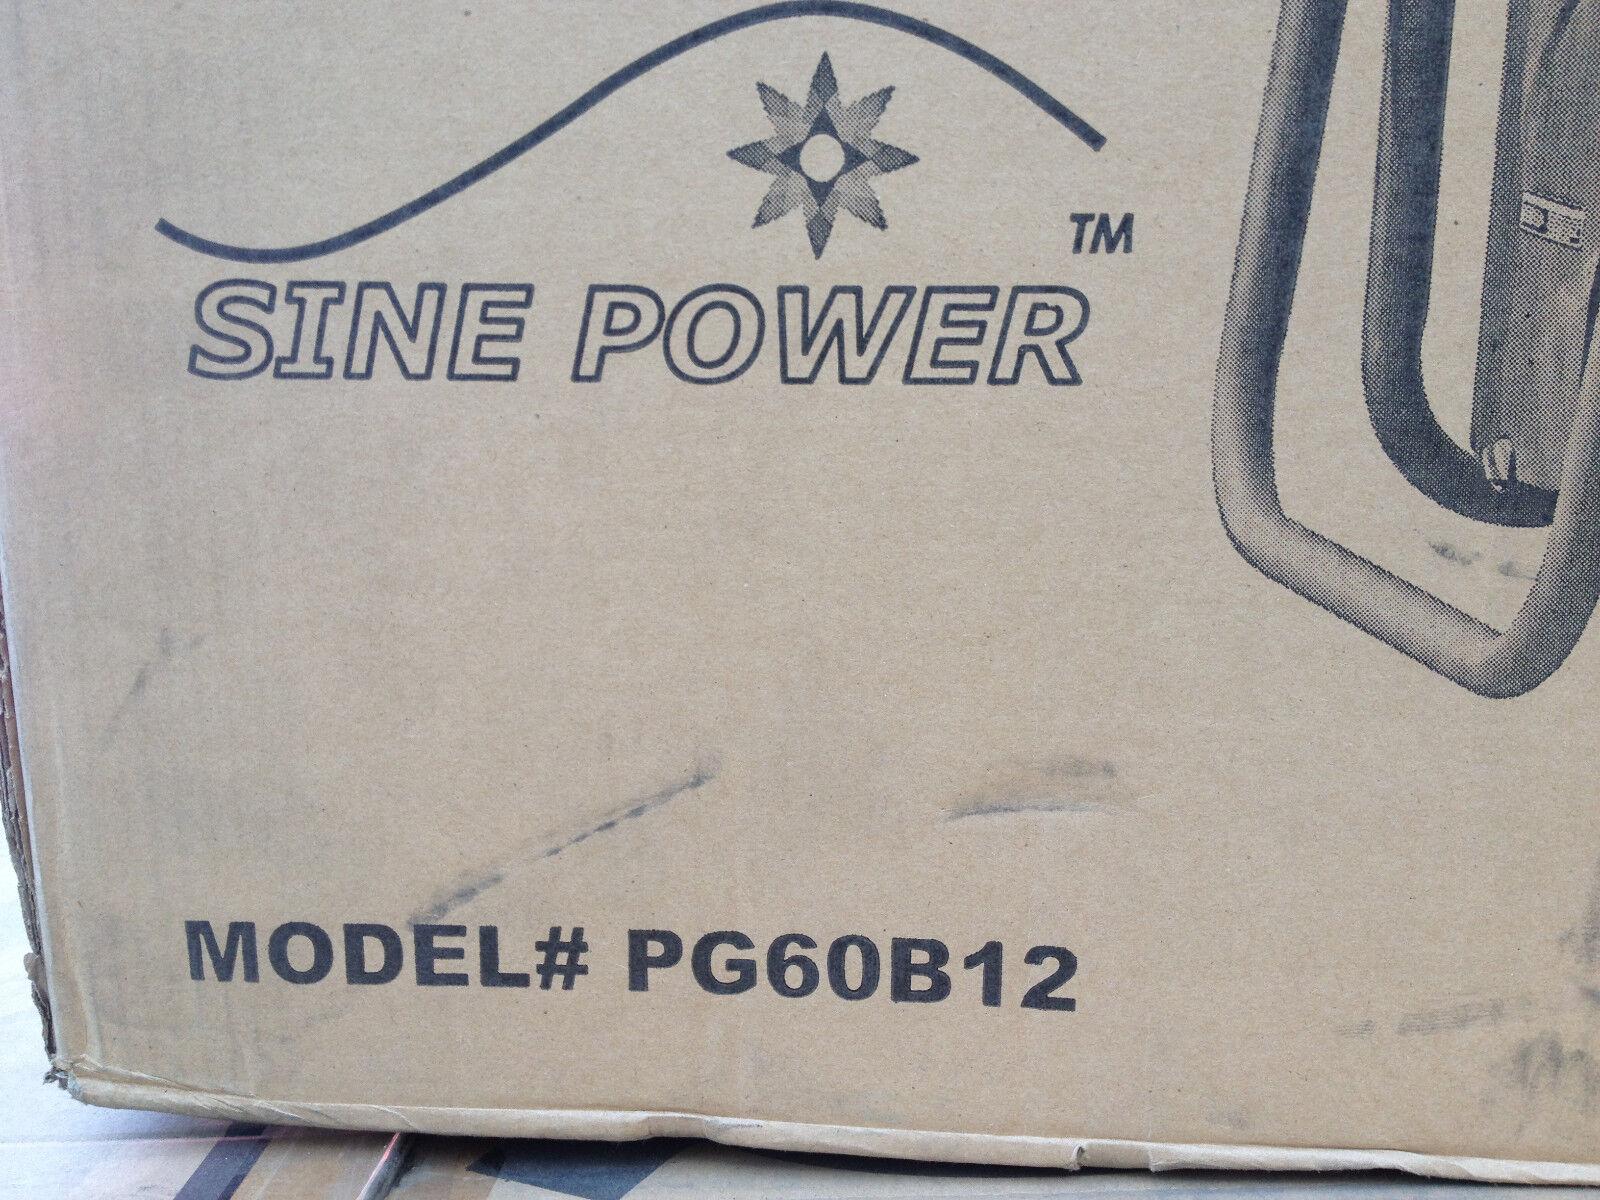 ETQ PG60B12 Portable Propane 7000 Watt Generator